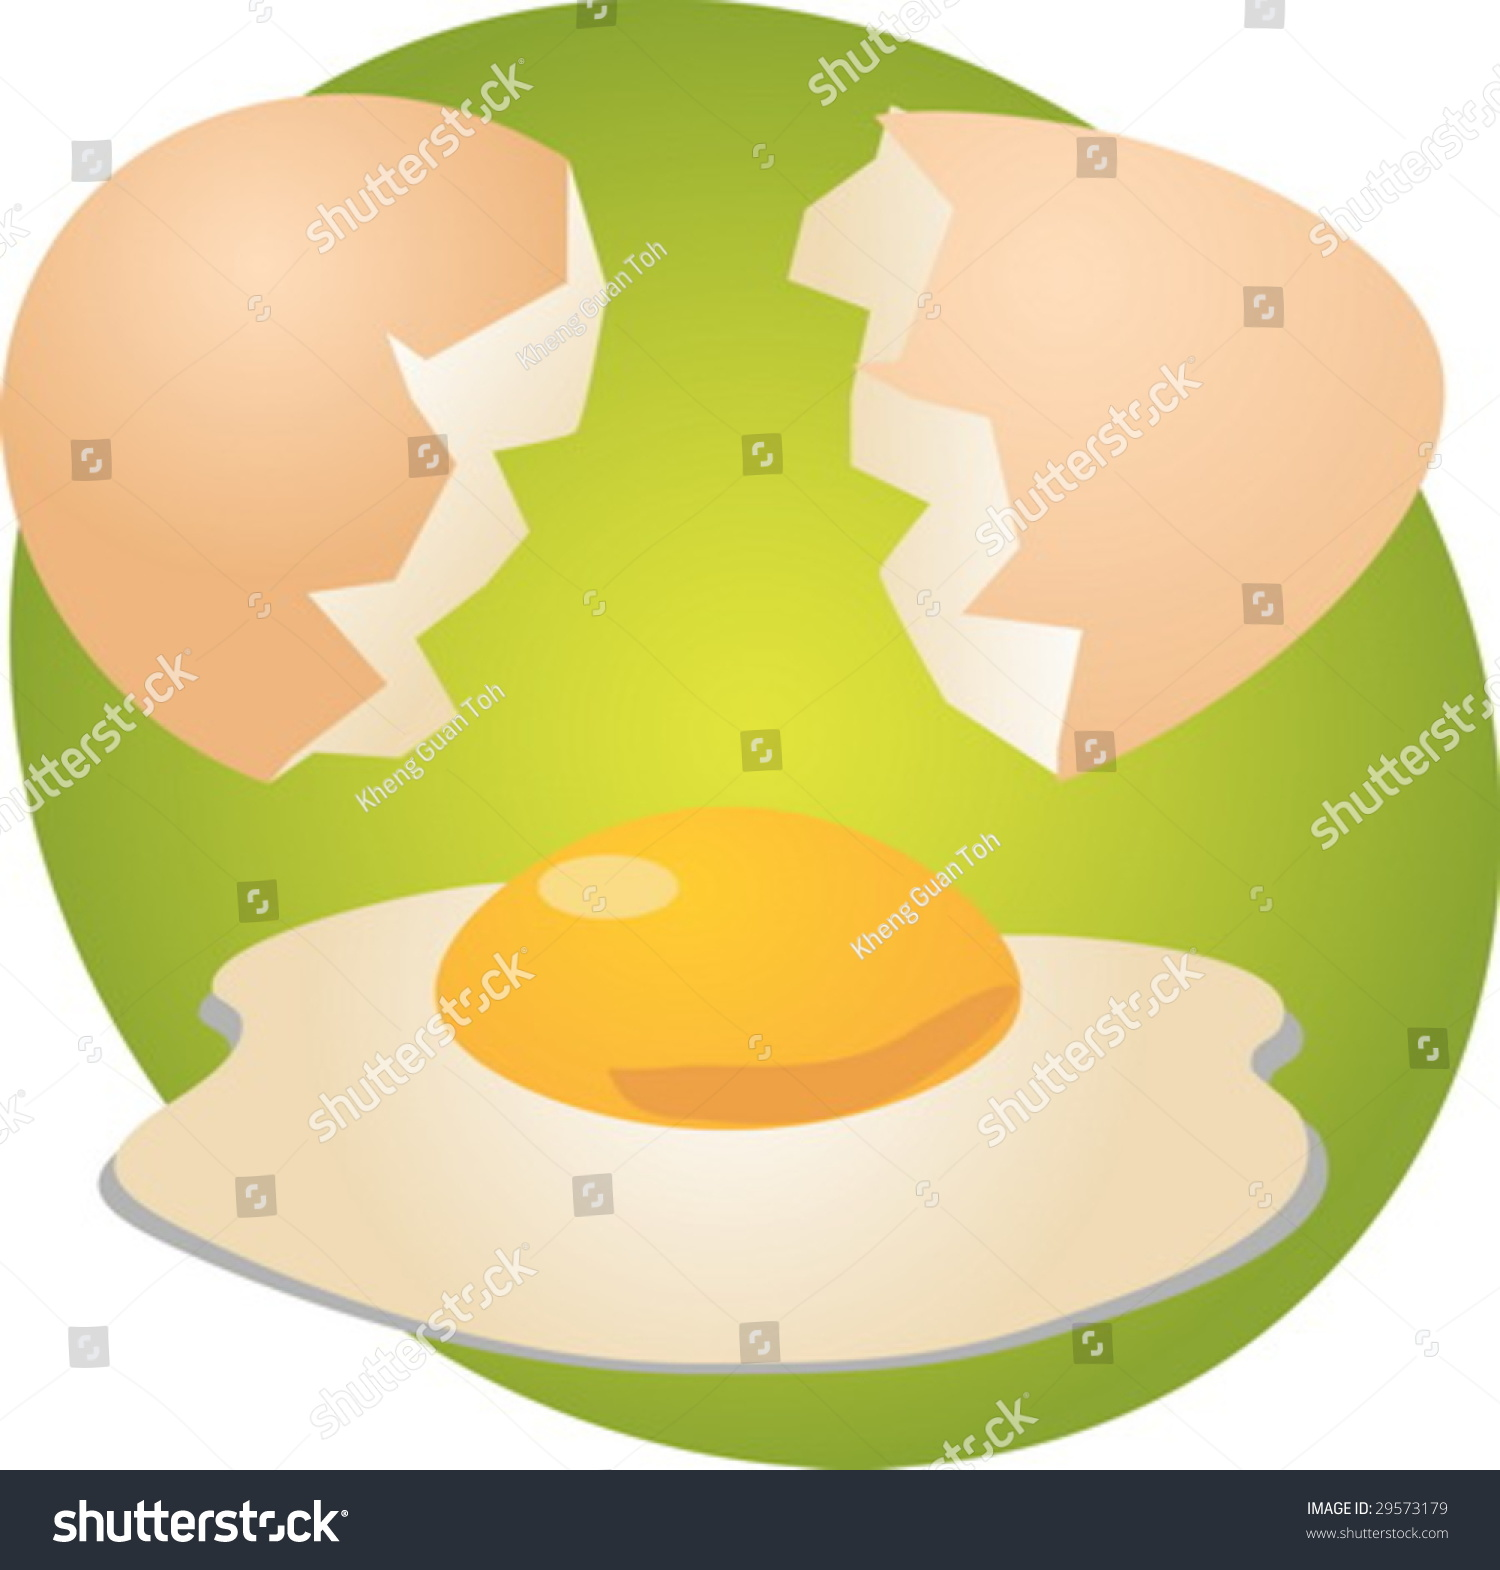 Egg Illustration Clipart Open Shell Yolk Stock Vector 29573179 ... for Clipart Yolk  75tgx